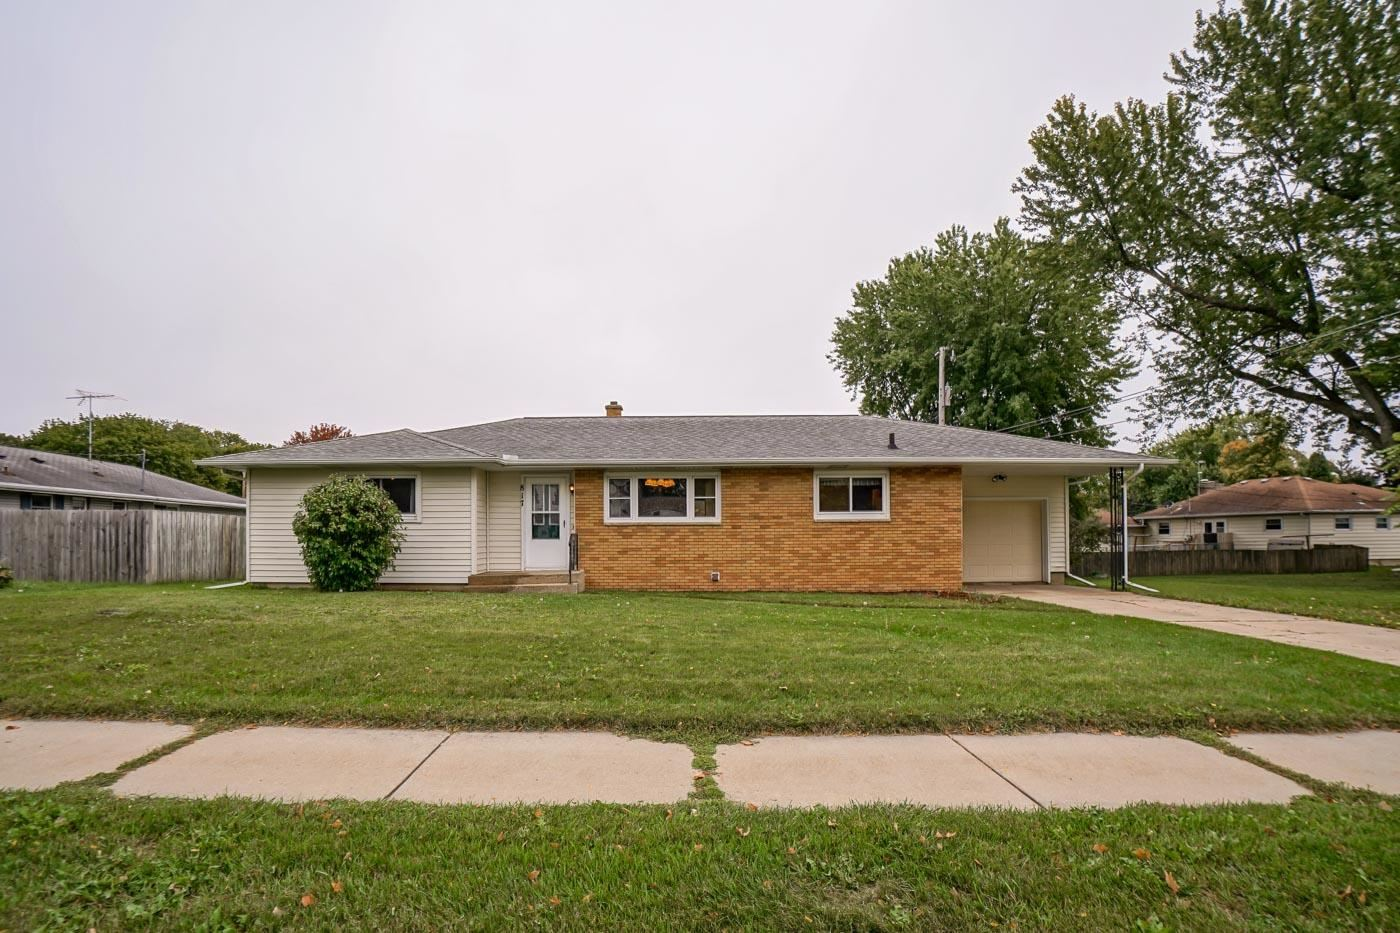 Photo for 817 N Bristol St, Sun Prairie, WI 53590-1440 (MLS # 1921240)